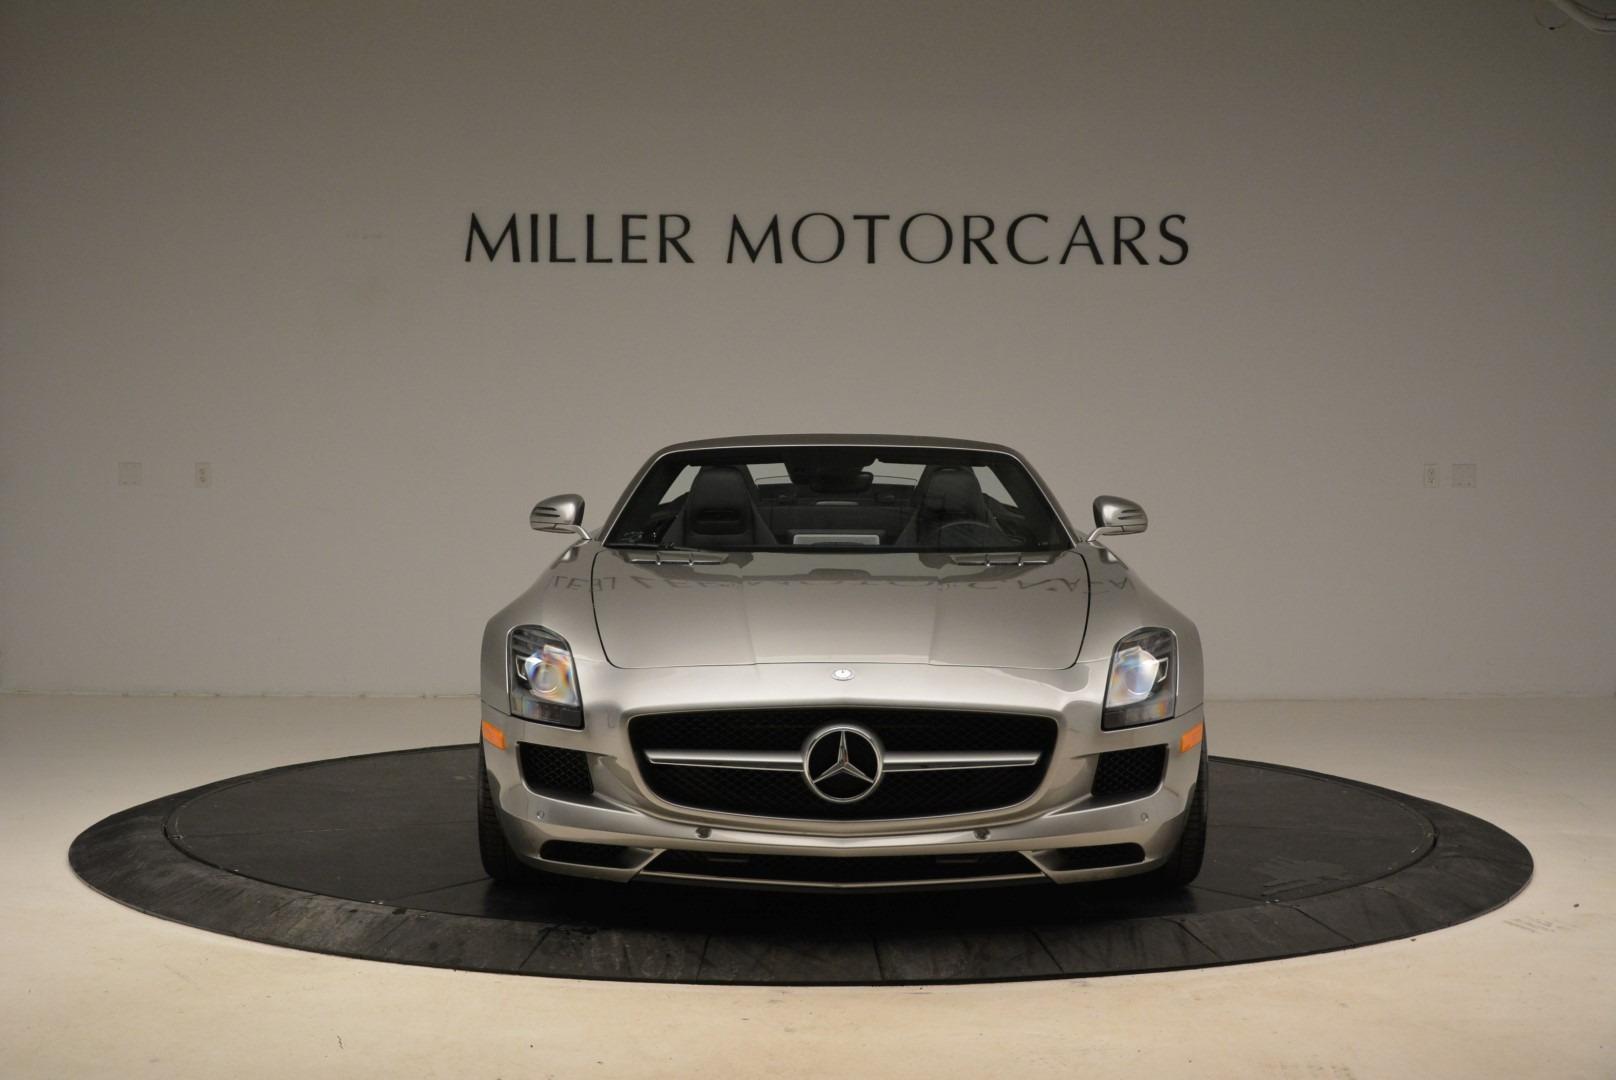 Used 2012 Mercedes-Benz SLS AMG  For Sale In Westport, CT 2068_p12